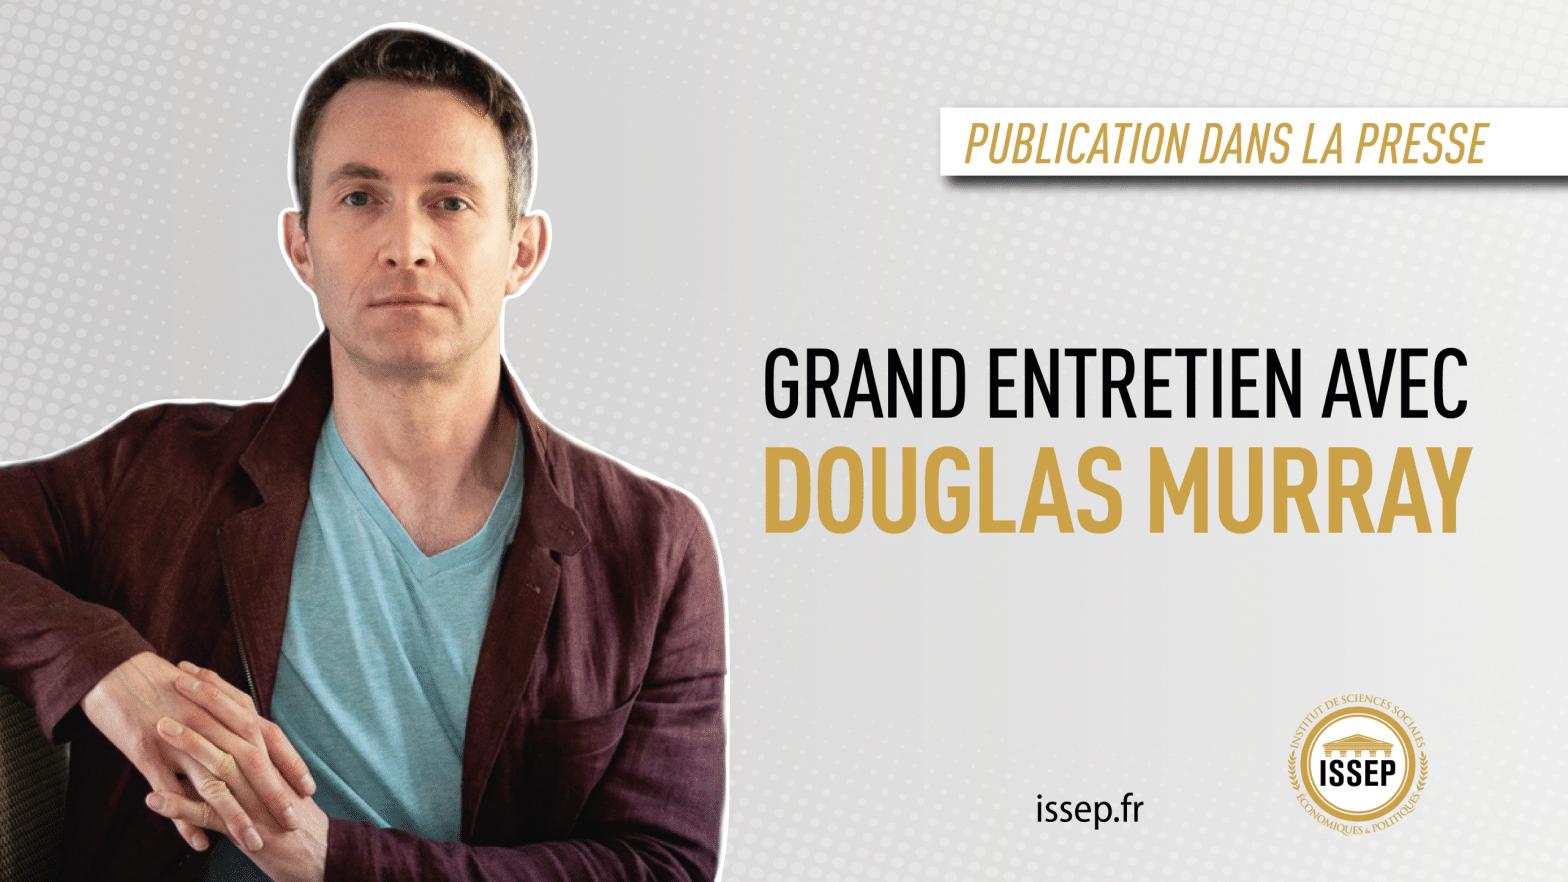 Grand entretien avec Douglas Murray